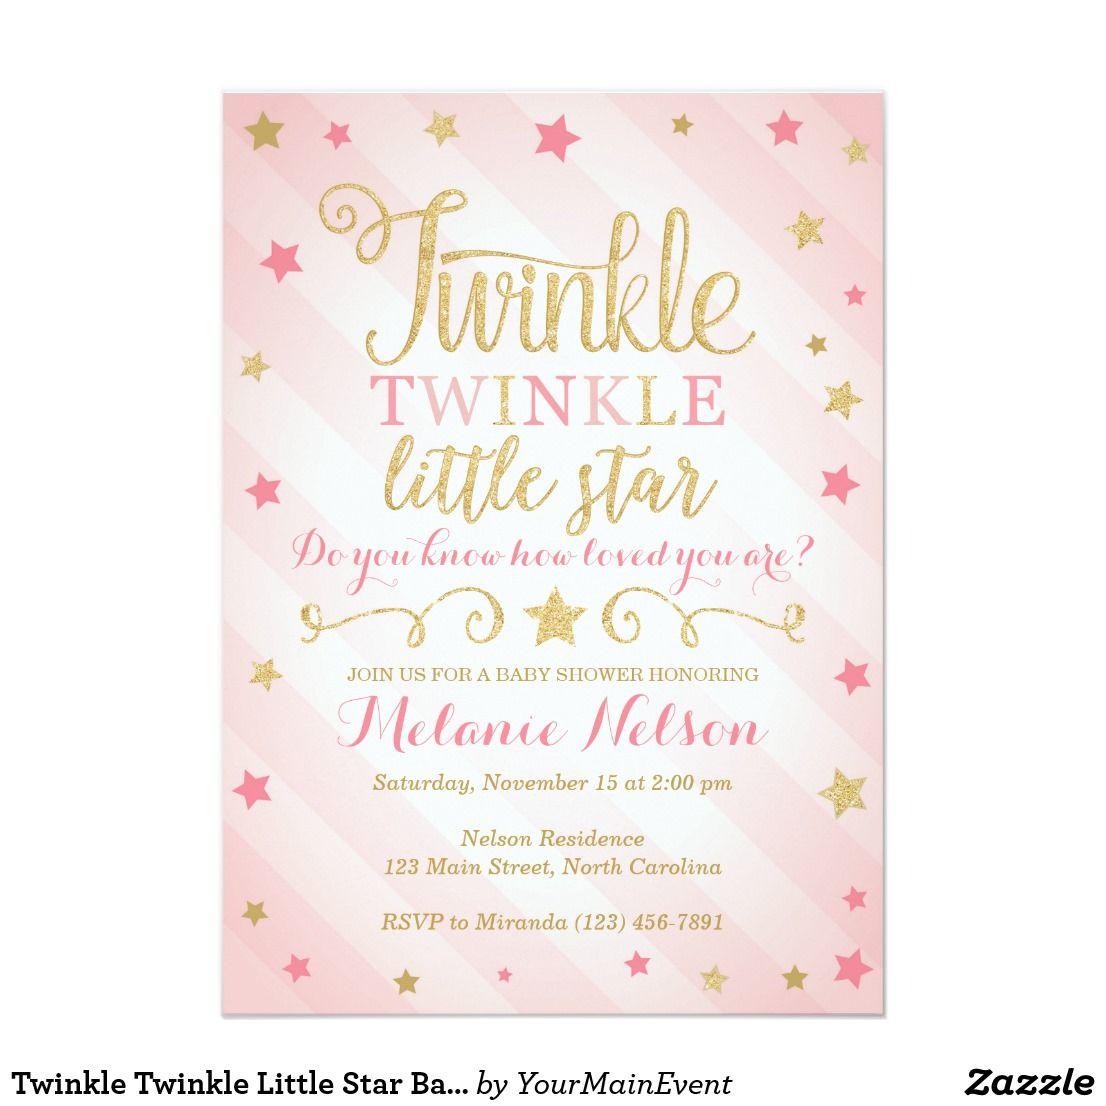 Twinkle Twinkle Little Star Baby Shower Invitation | Star baby ...